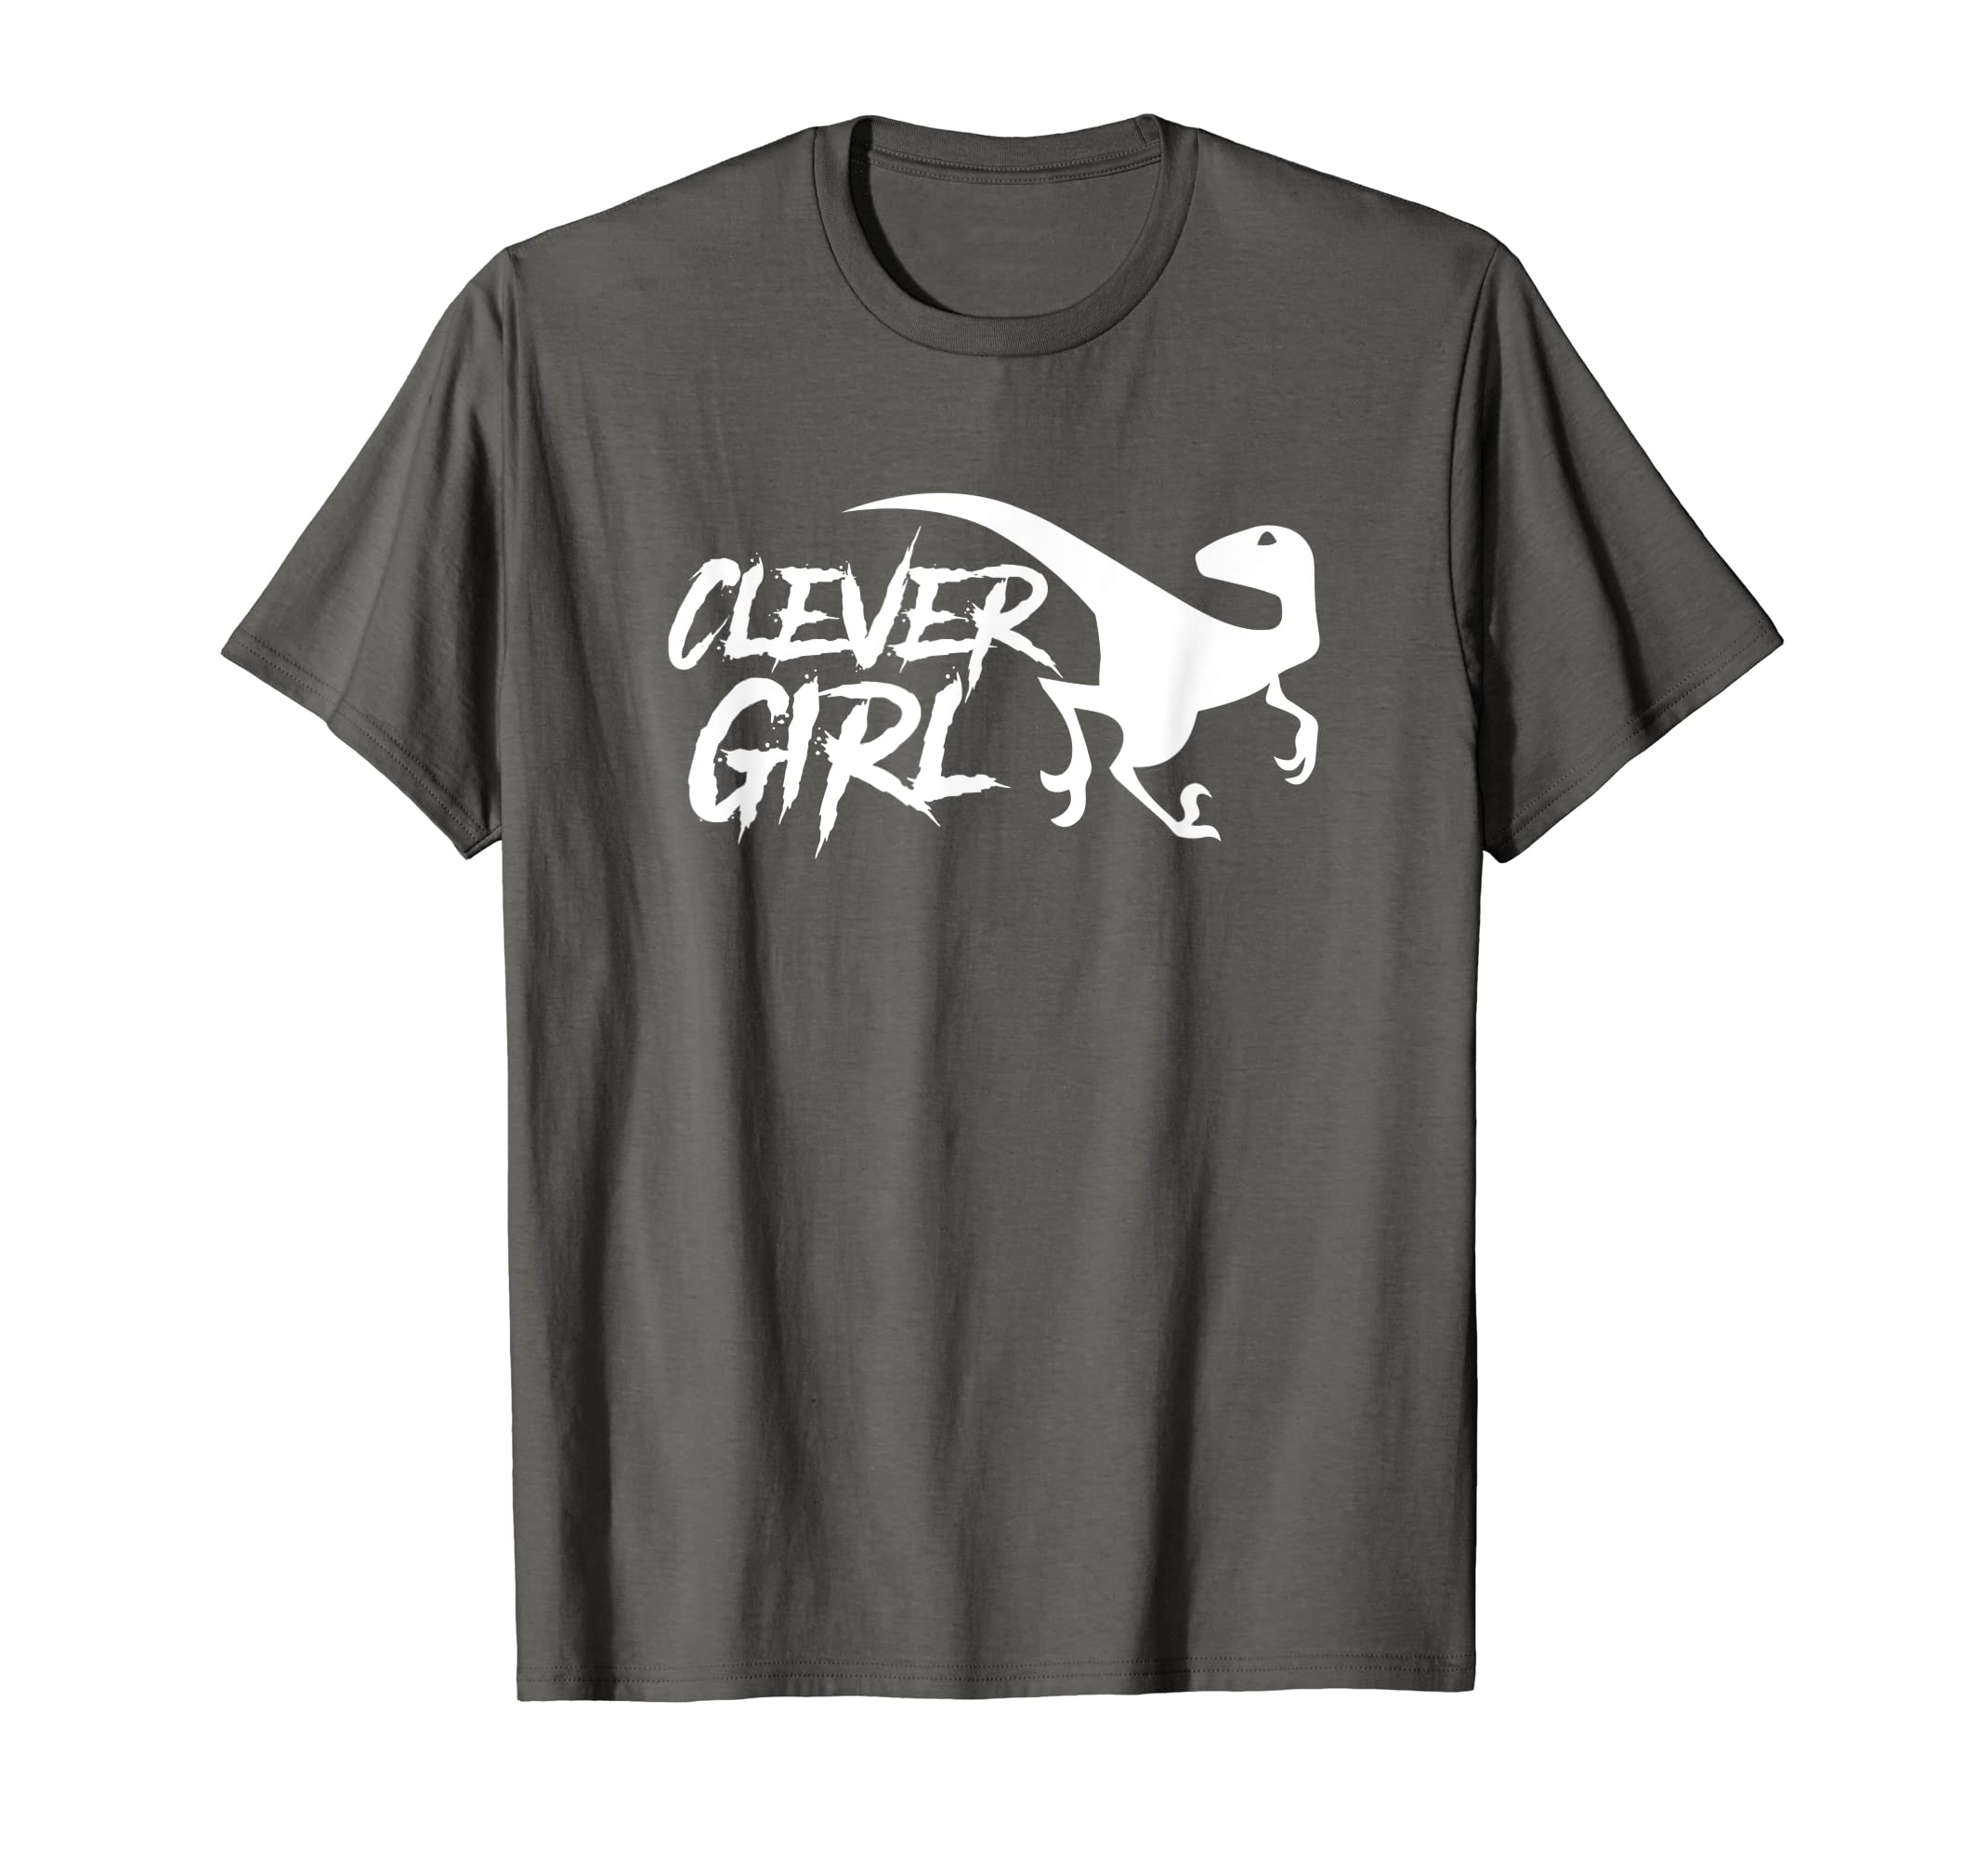 c3c536f21 Amazon.com: Clever Girl - Dinosaur - Velociraptor - Cool Dinosaur Shirt:  Clothing